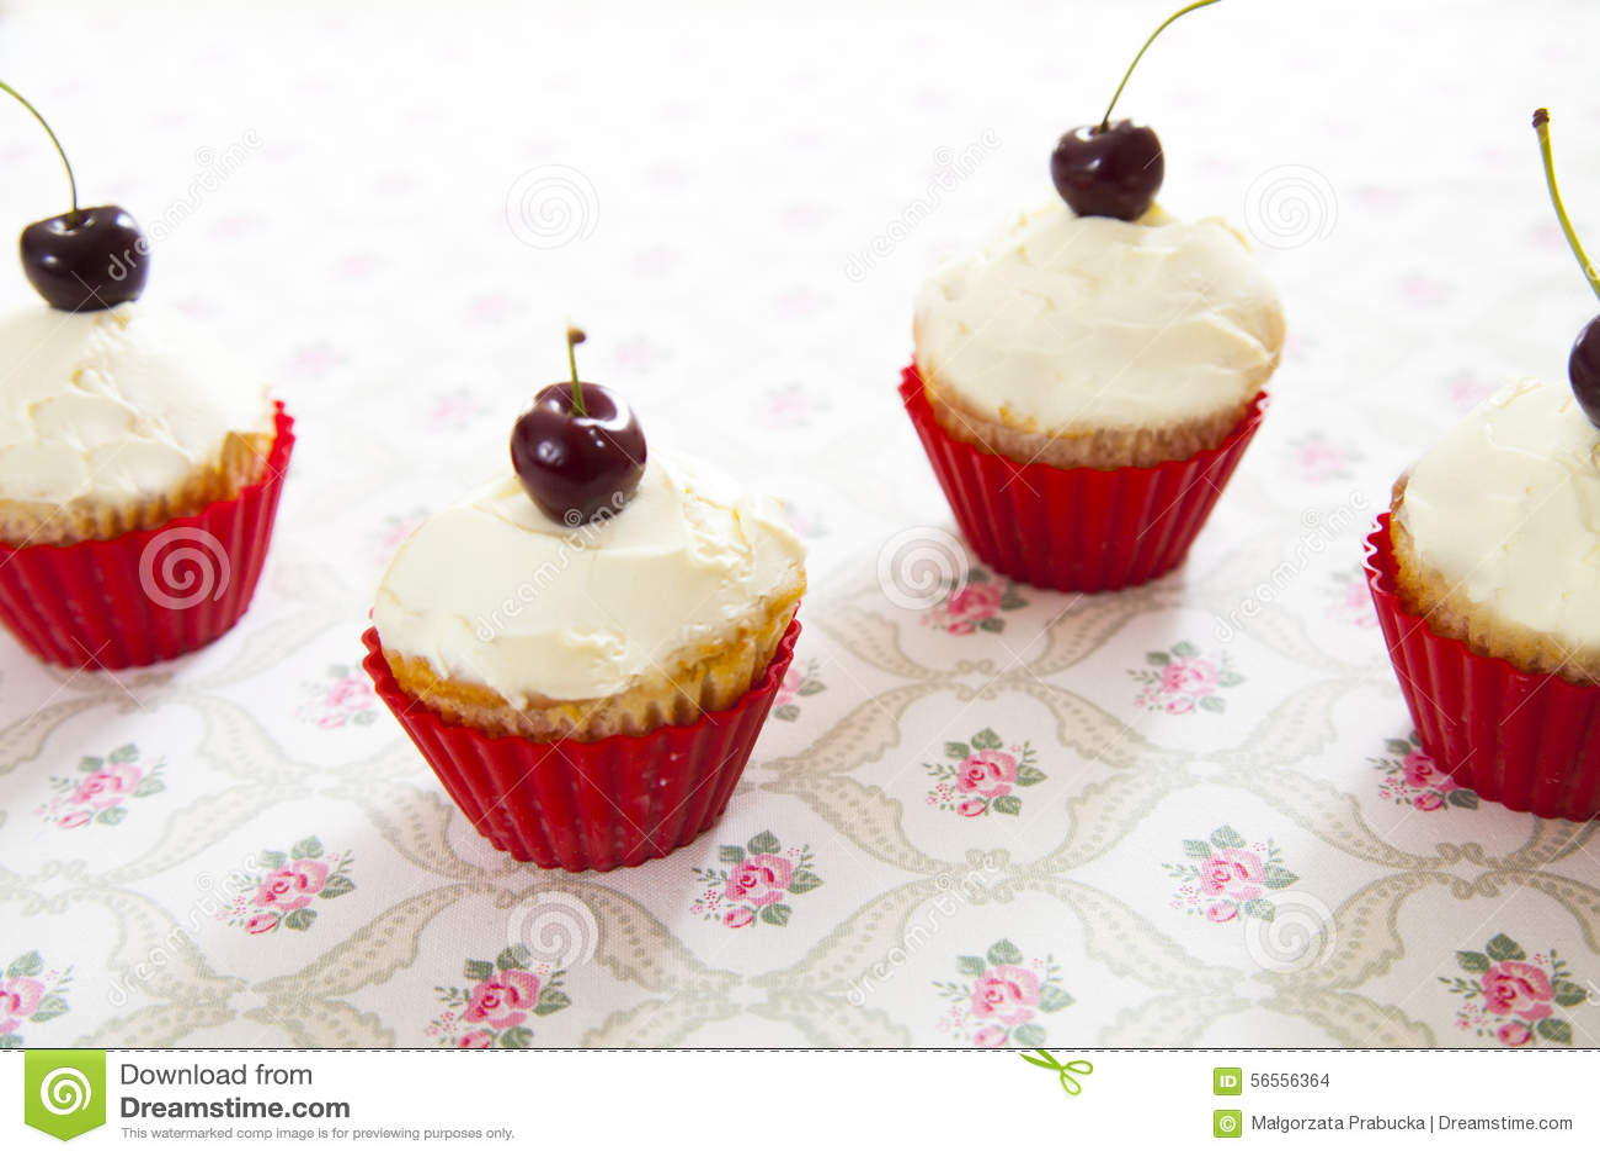 Download Cupcakes στοκ εικόνες. εικόνα από κέικ, cupcake, κεράσια - 56556364